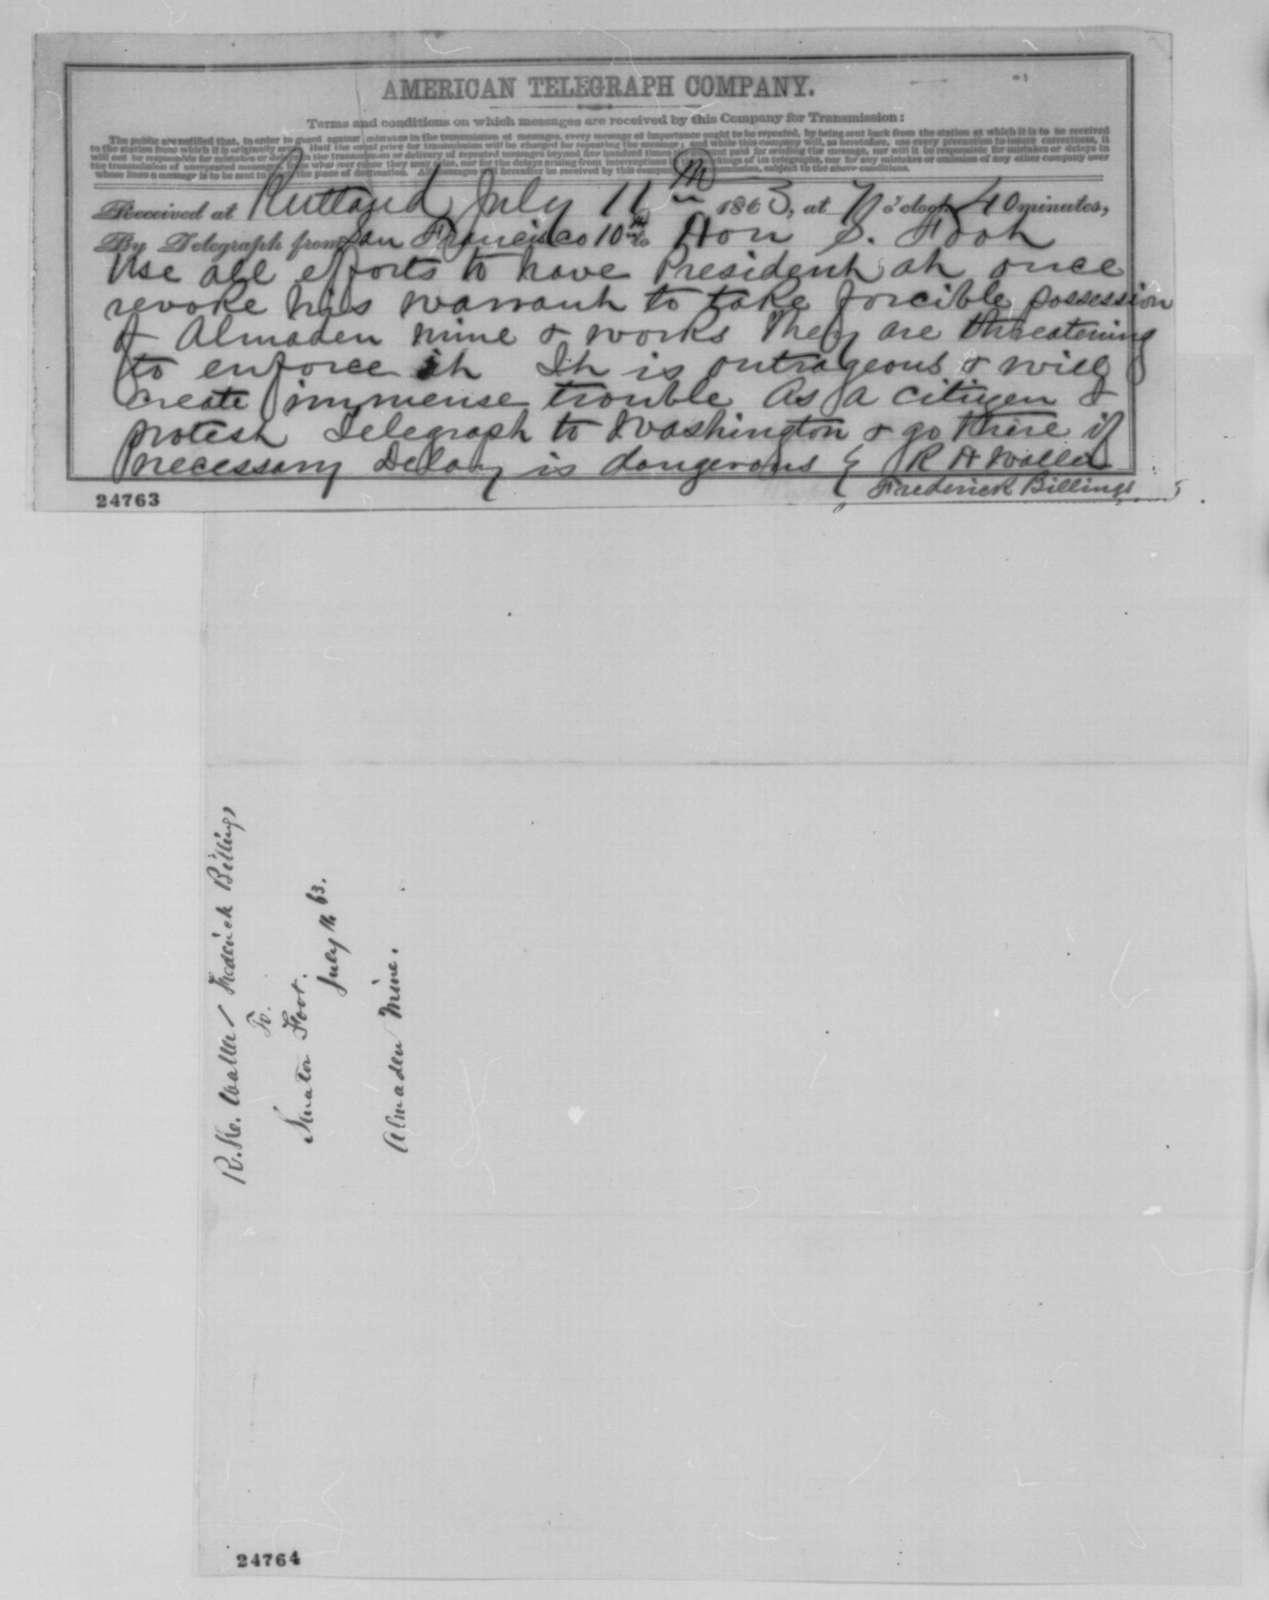 Royal Hiram Waller and Frederick Billings to Solomon Foot, Saturday, July 11, 1863  (Telegram concerning New Almanden mine)